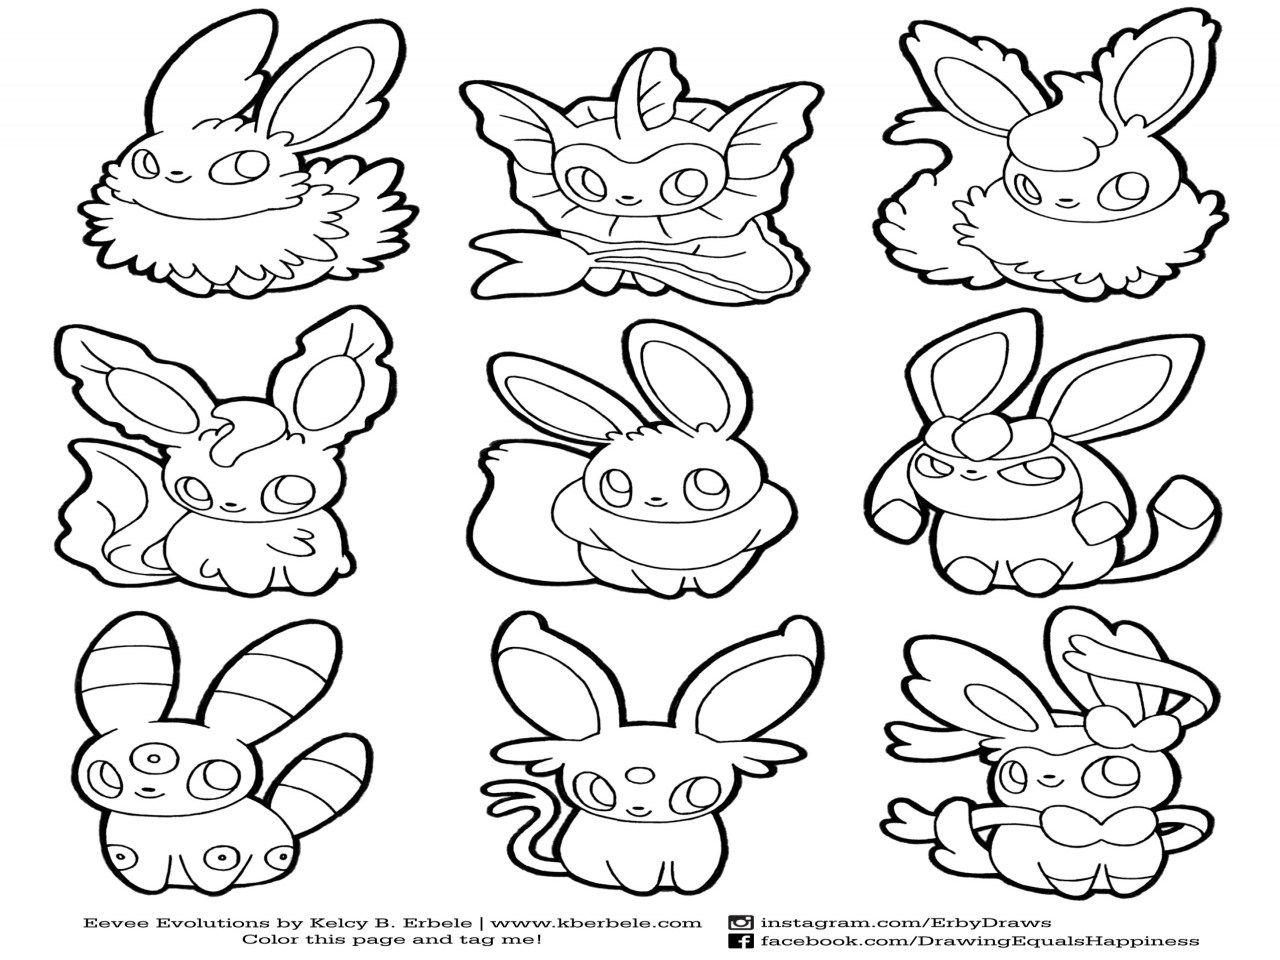 Eevee Evolutions Coloring Page Elegant Pokemon Coloring Pages Eevee Evolutions Google Search F Pokemon Coloring Pages Pokemon Eevee Evolutions Eevee Evolutions